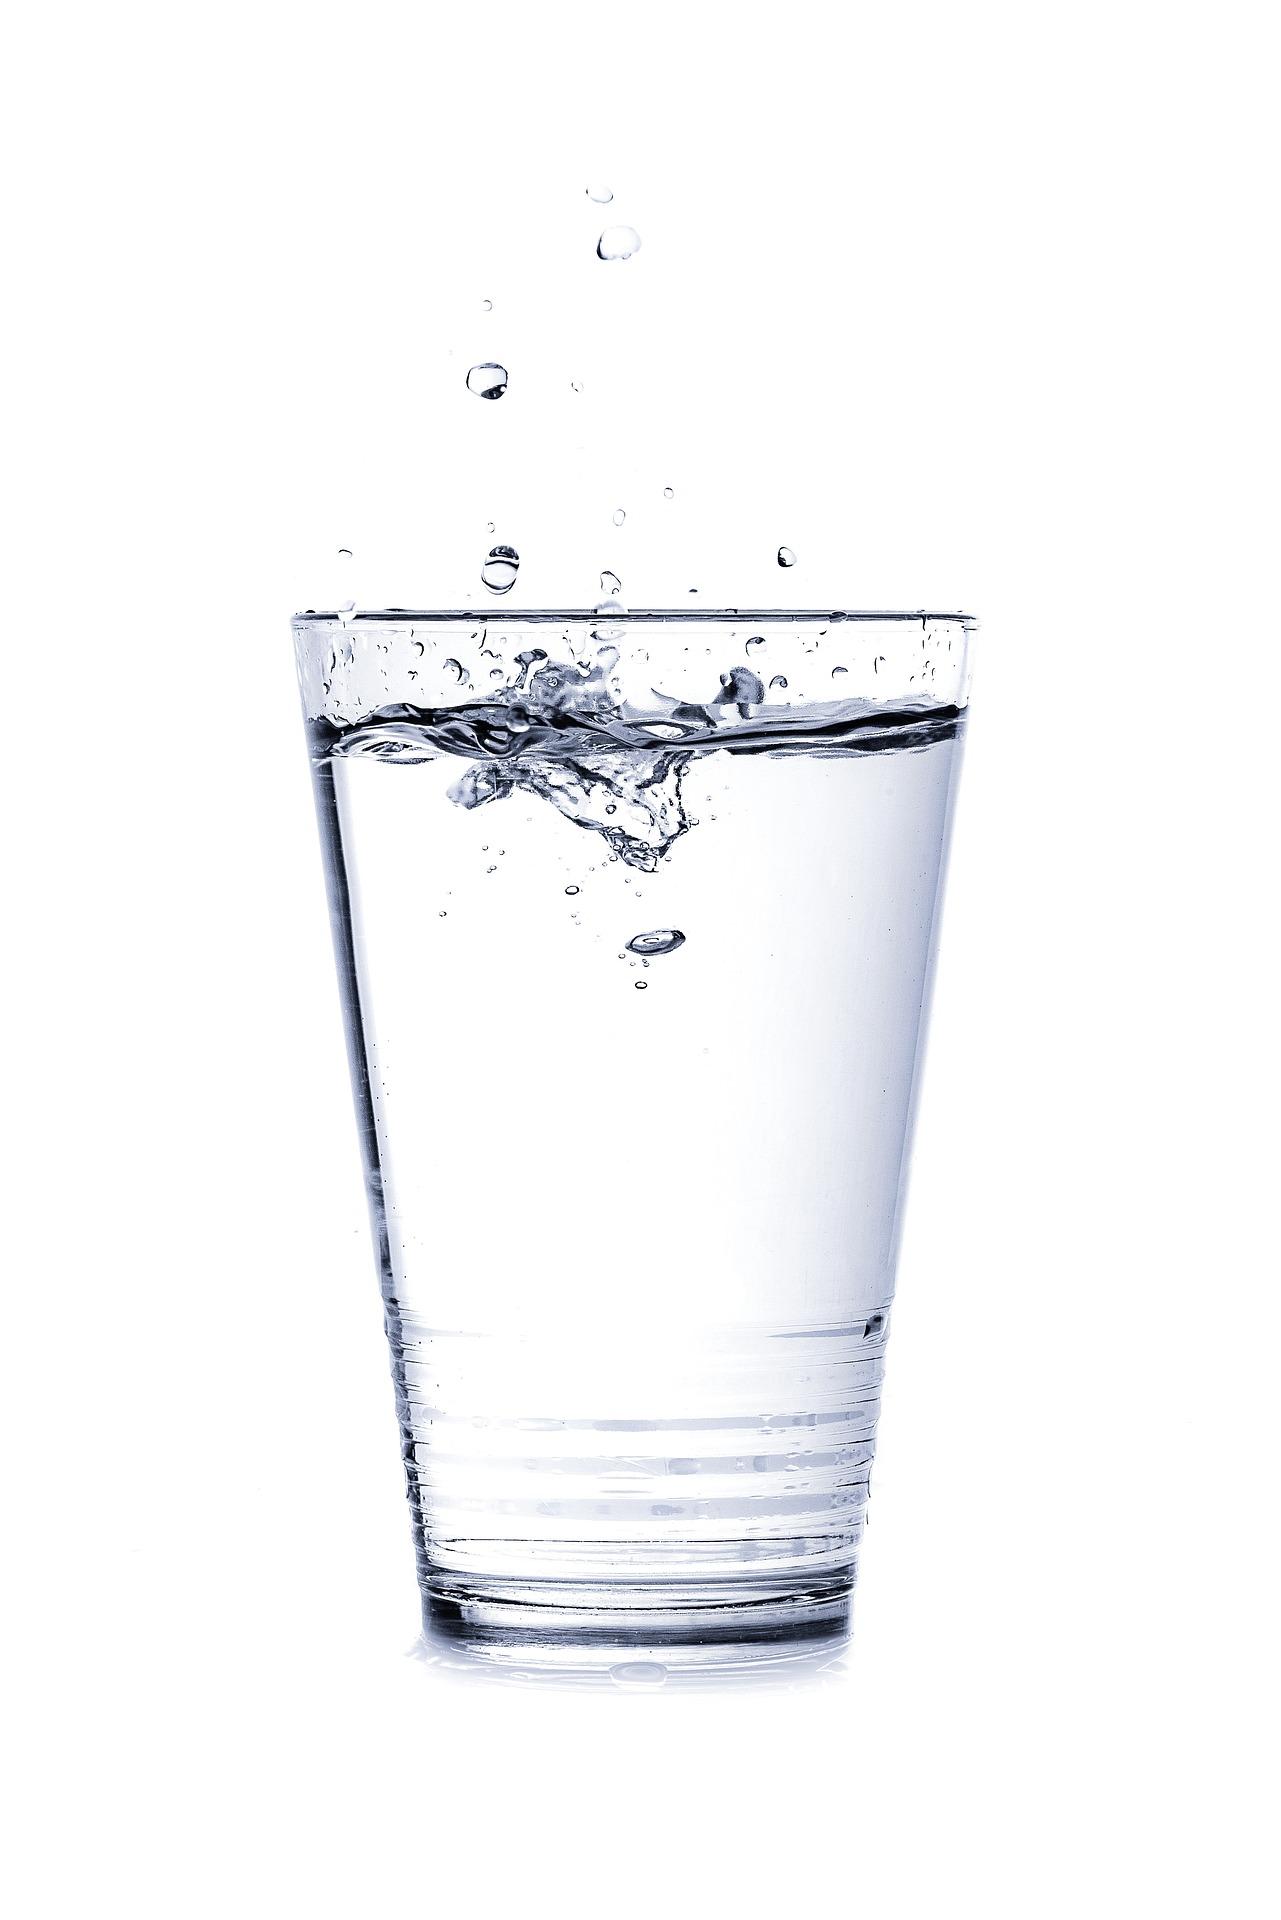 eau-hydratation-retention-eau